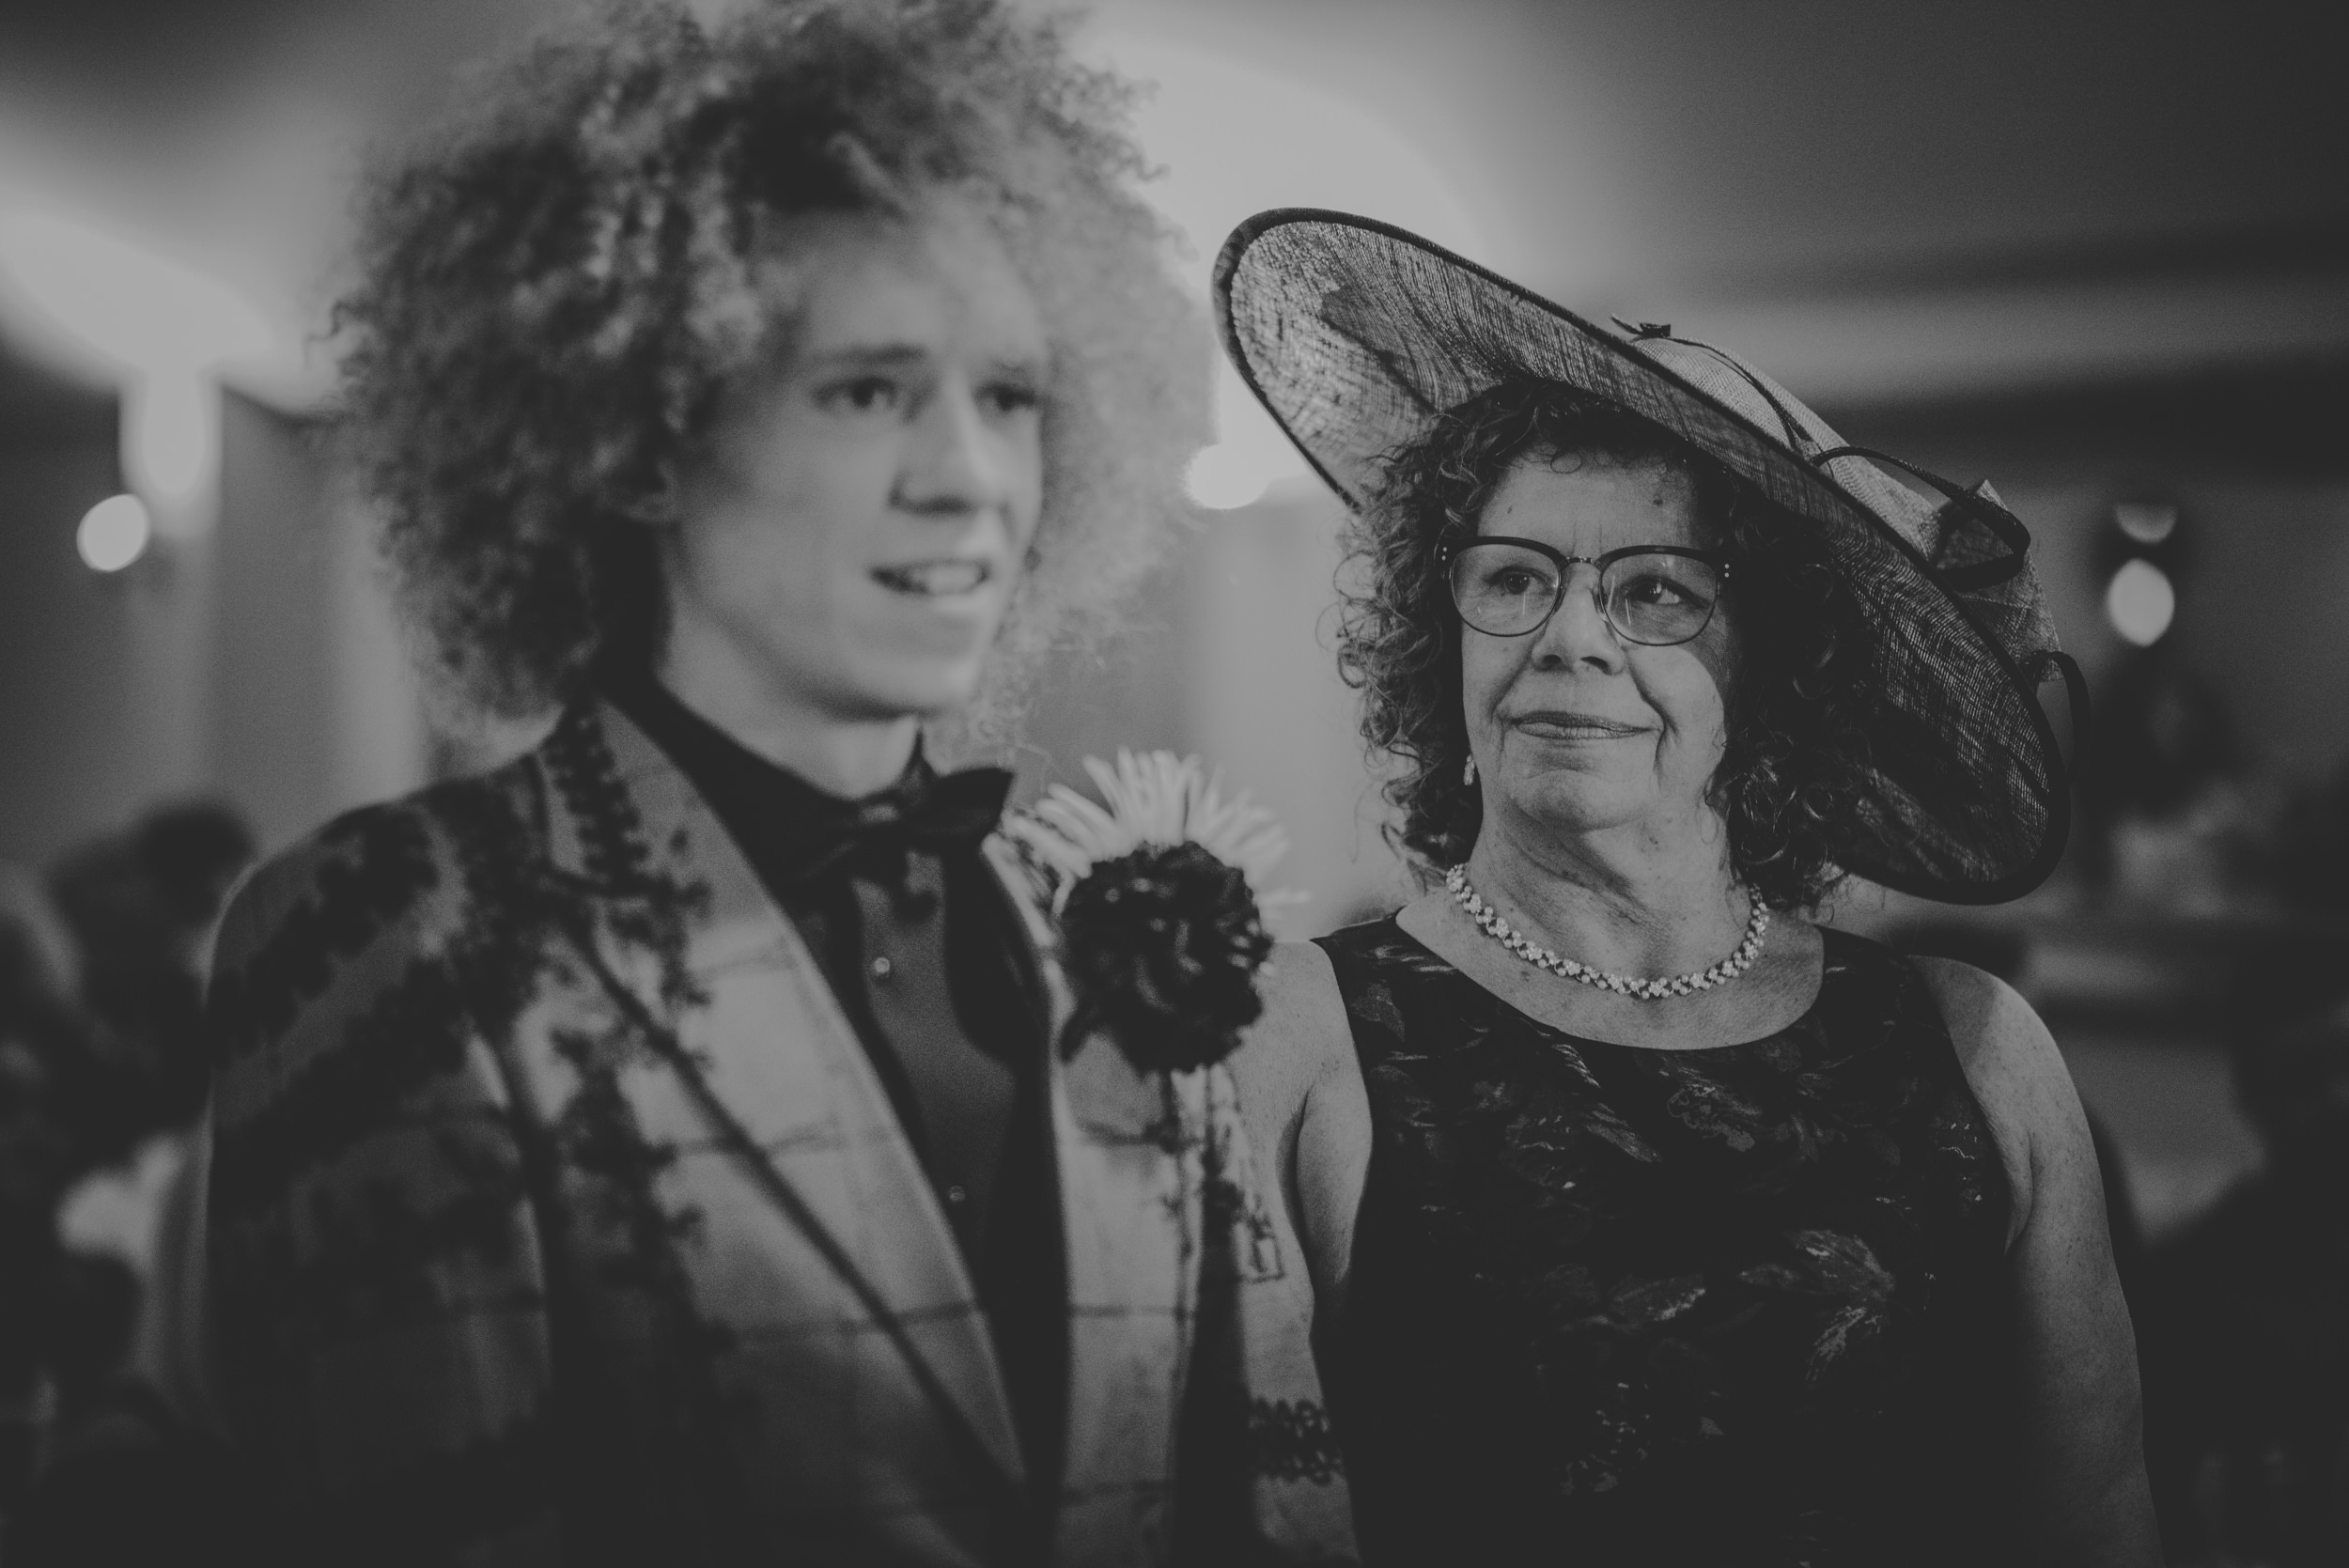 Barry-and-Chaz-wedding-Wasing-Park-Berkshire-Manu-Mendoza-Wedding-Photography-175.jpg